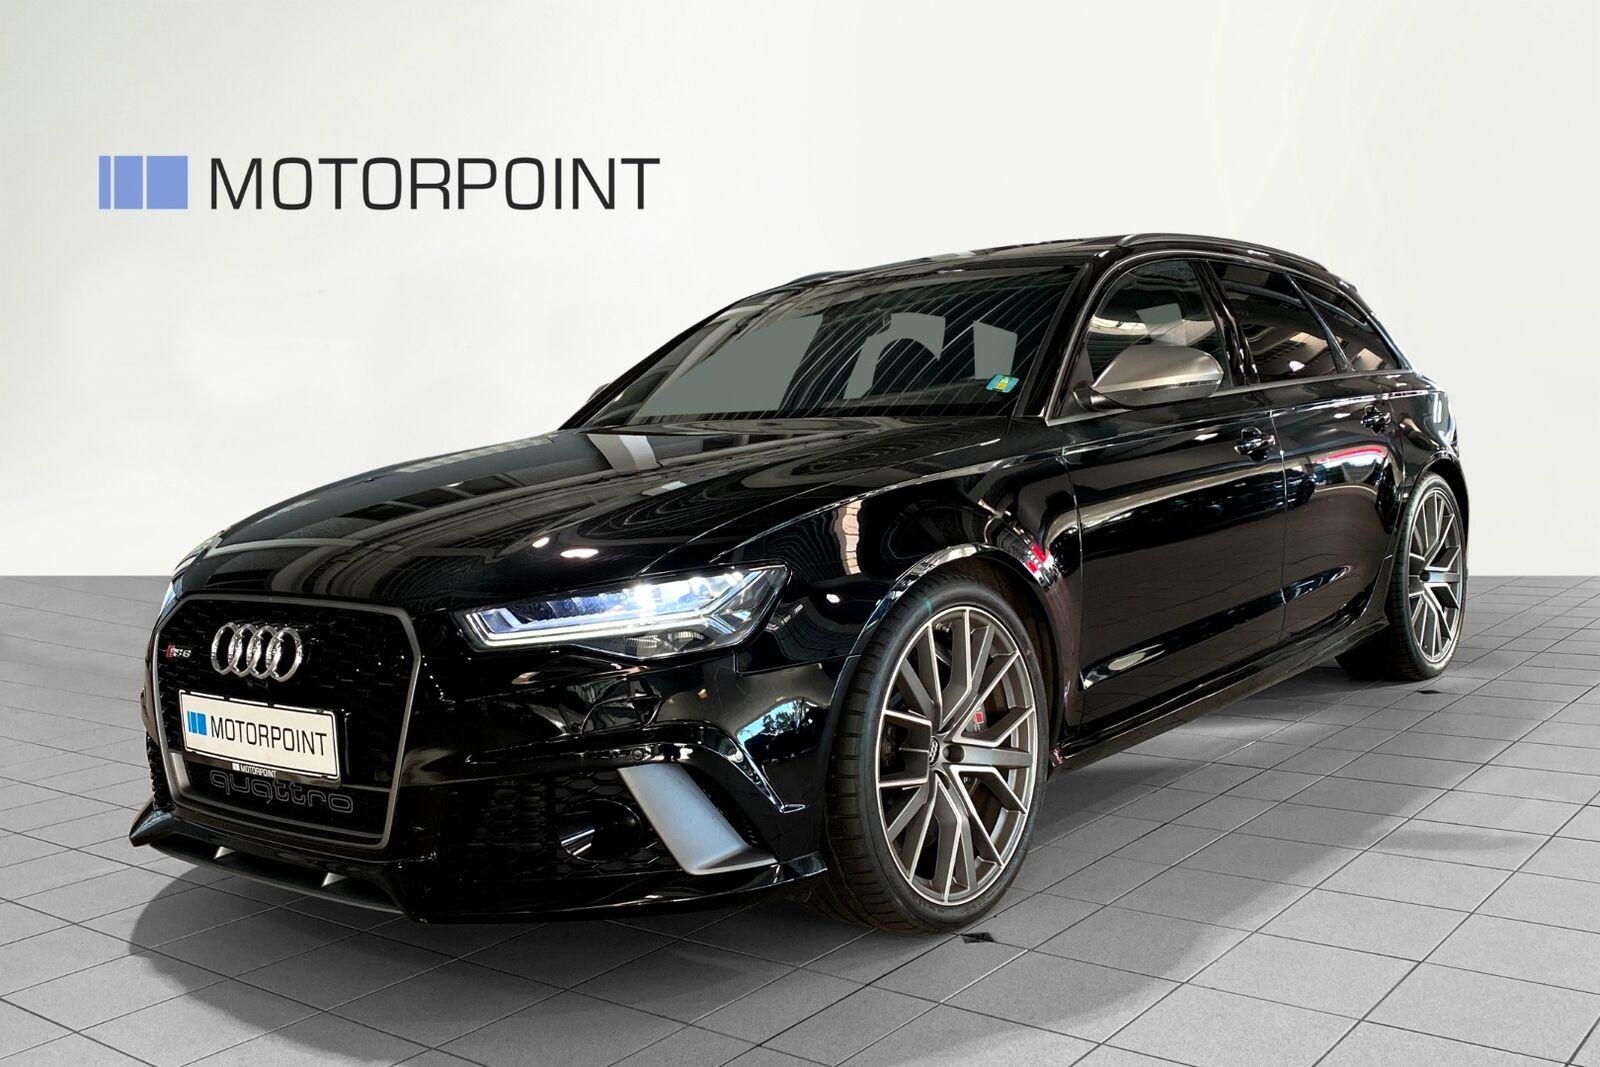 Audi RS6 4,0 TFSi performance Avant quattro 5d - 1.199.900 kr.